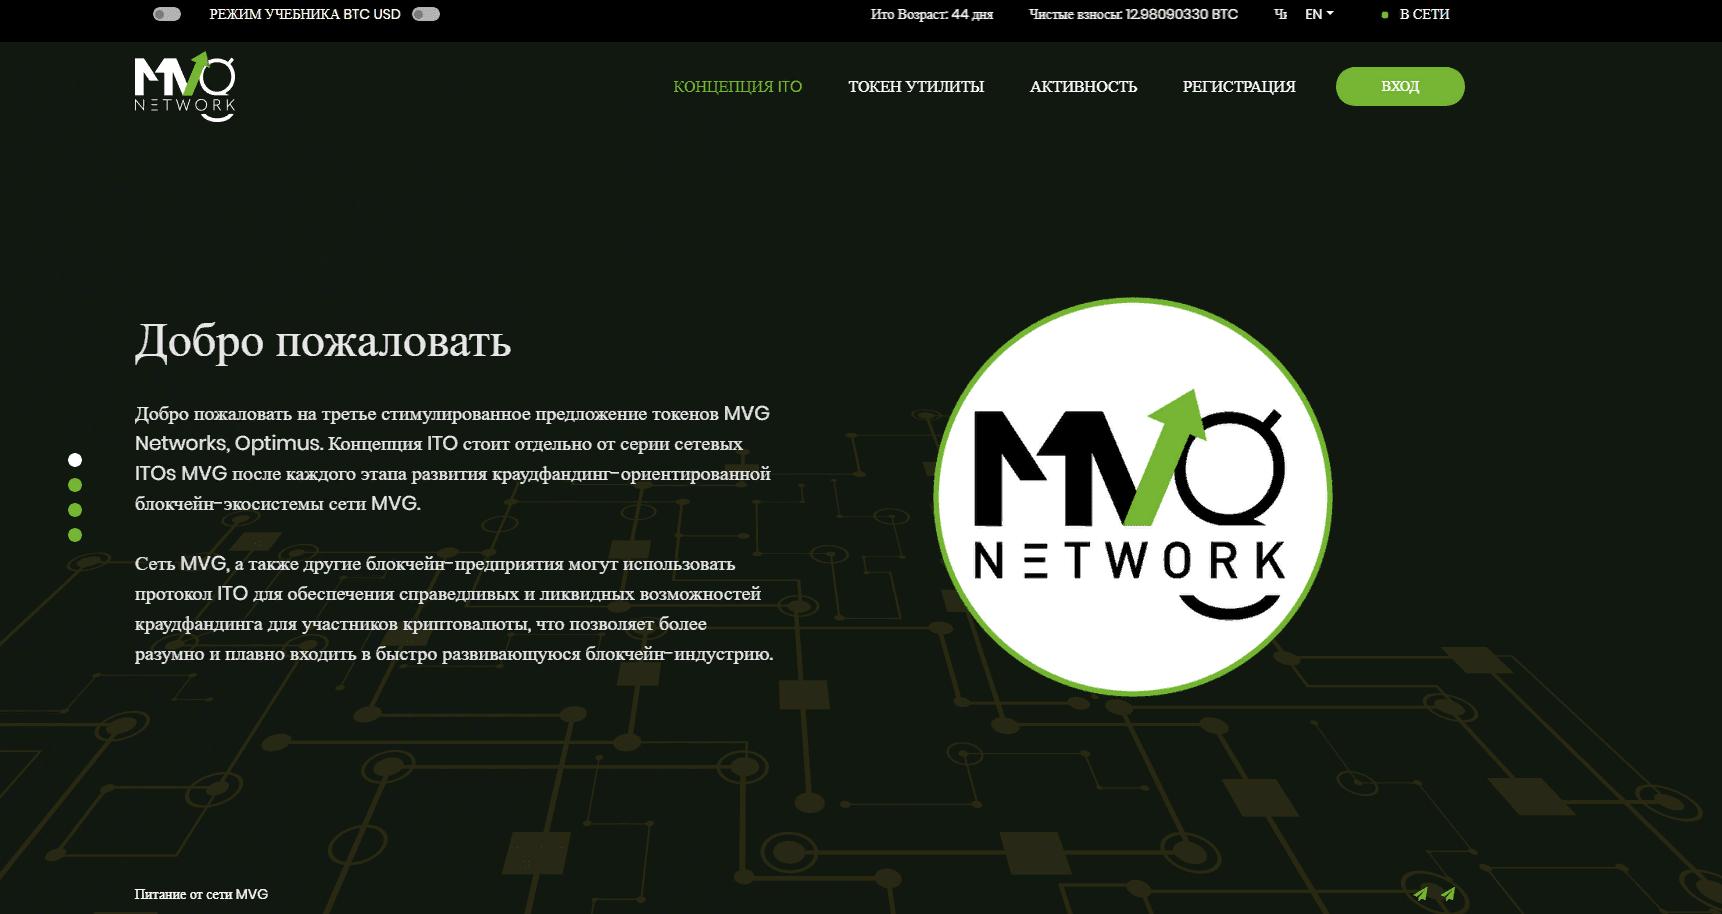 MVG Networks